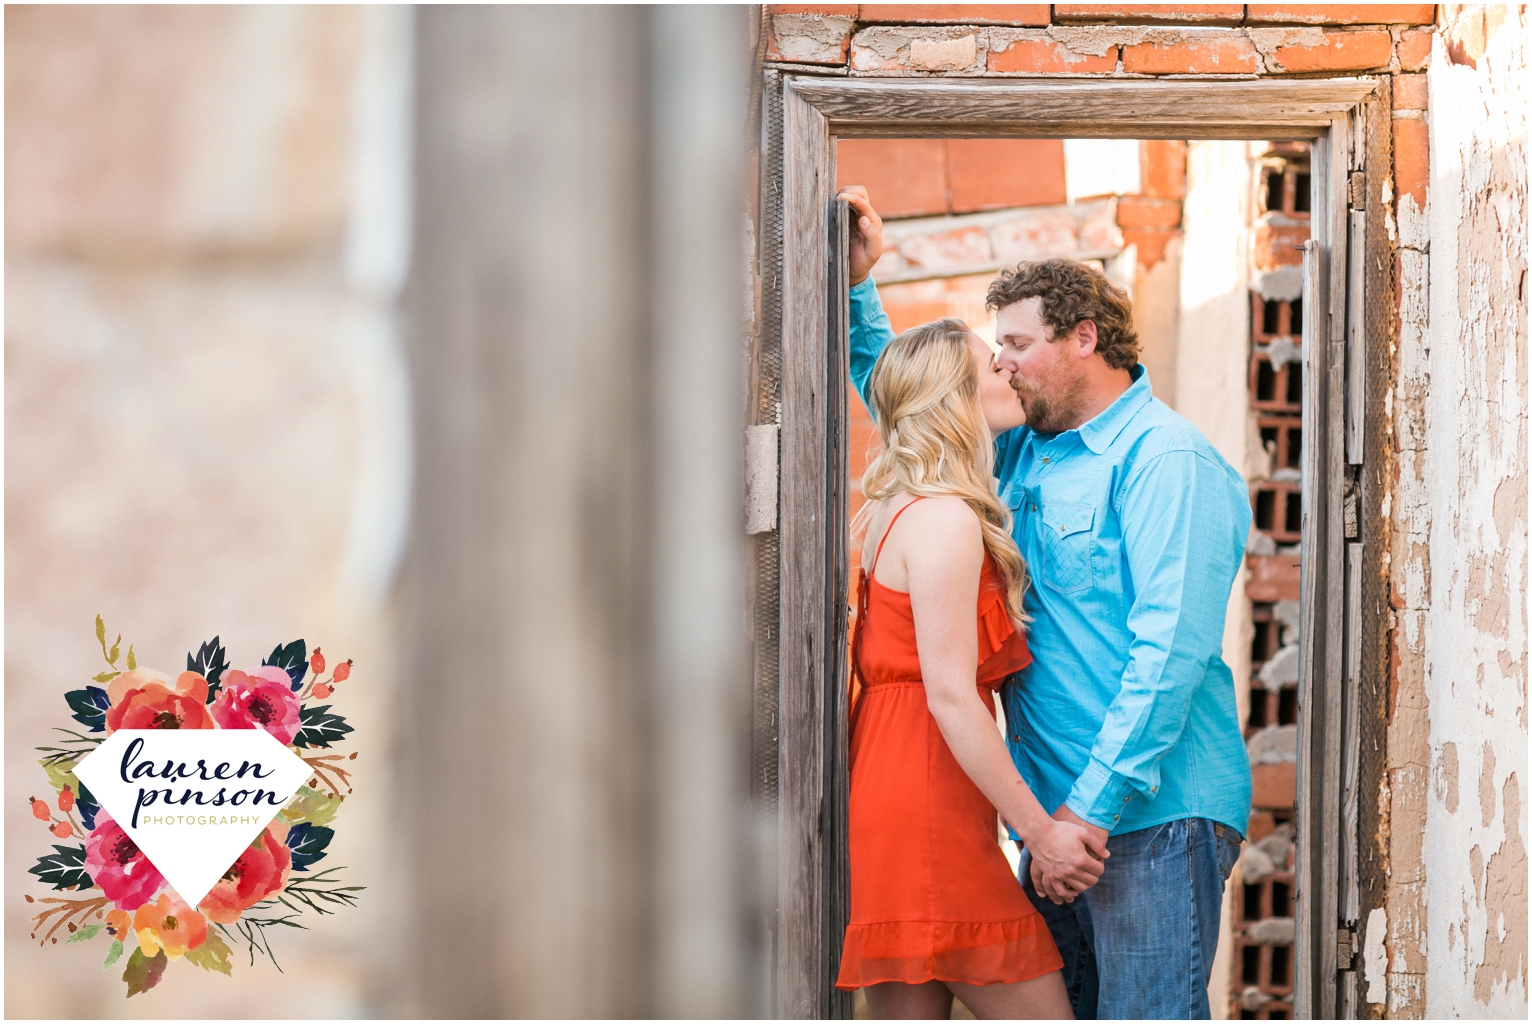 wichita-falls-wedding-photographer-engagement-session-texas-photography-oklahoma-engagement-wedding-photography_0639.jpg